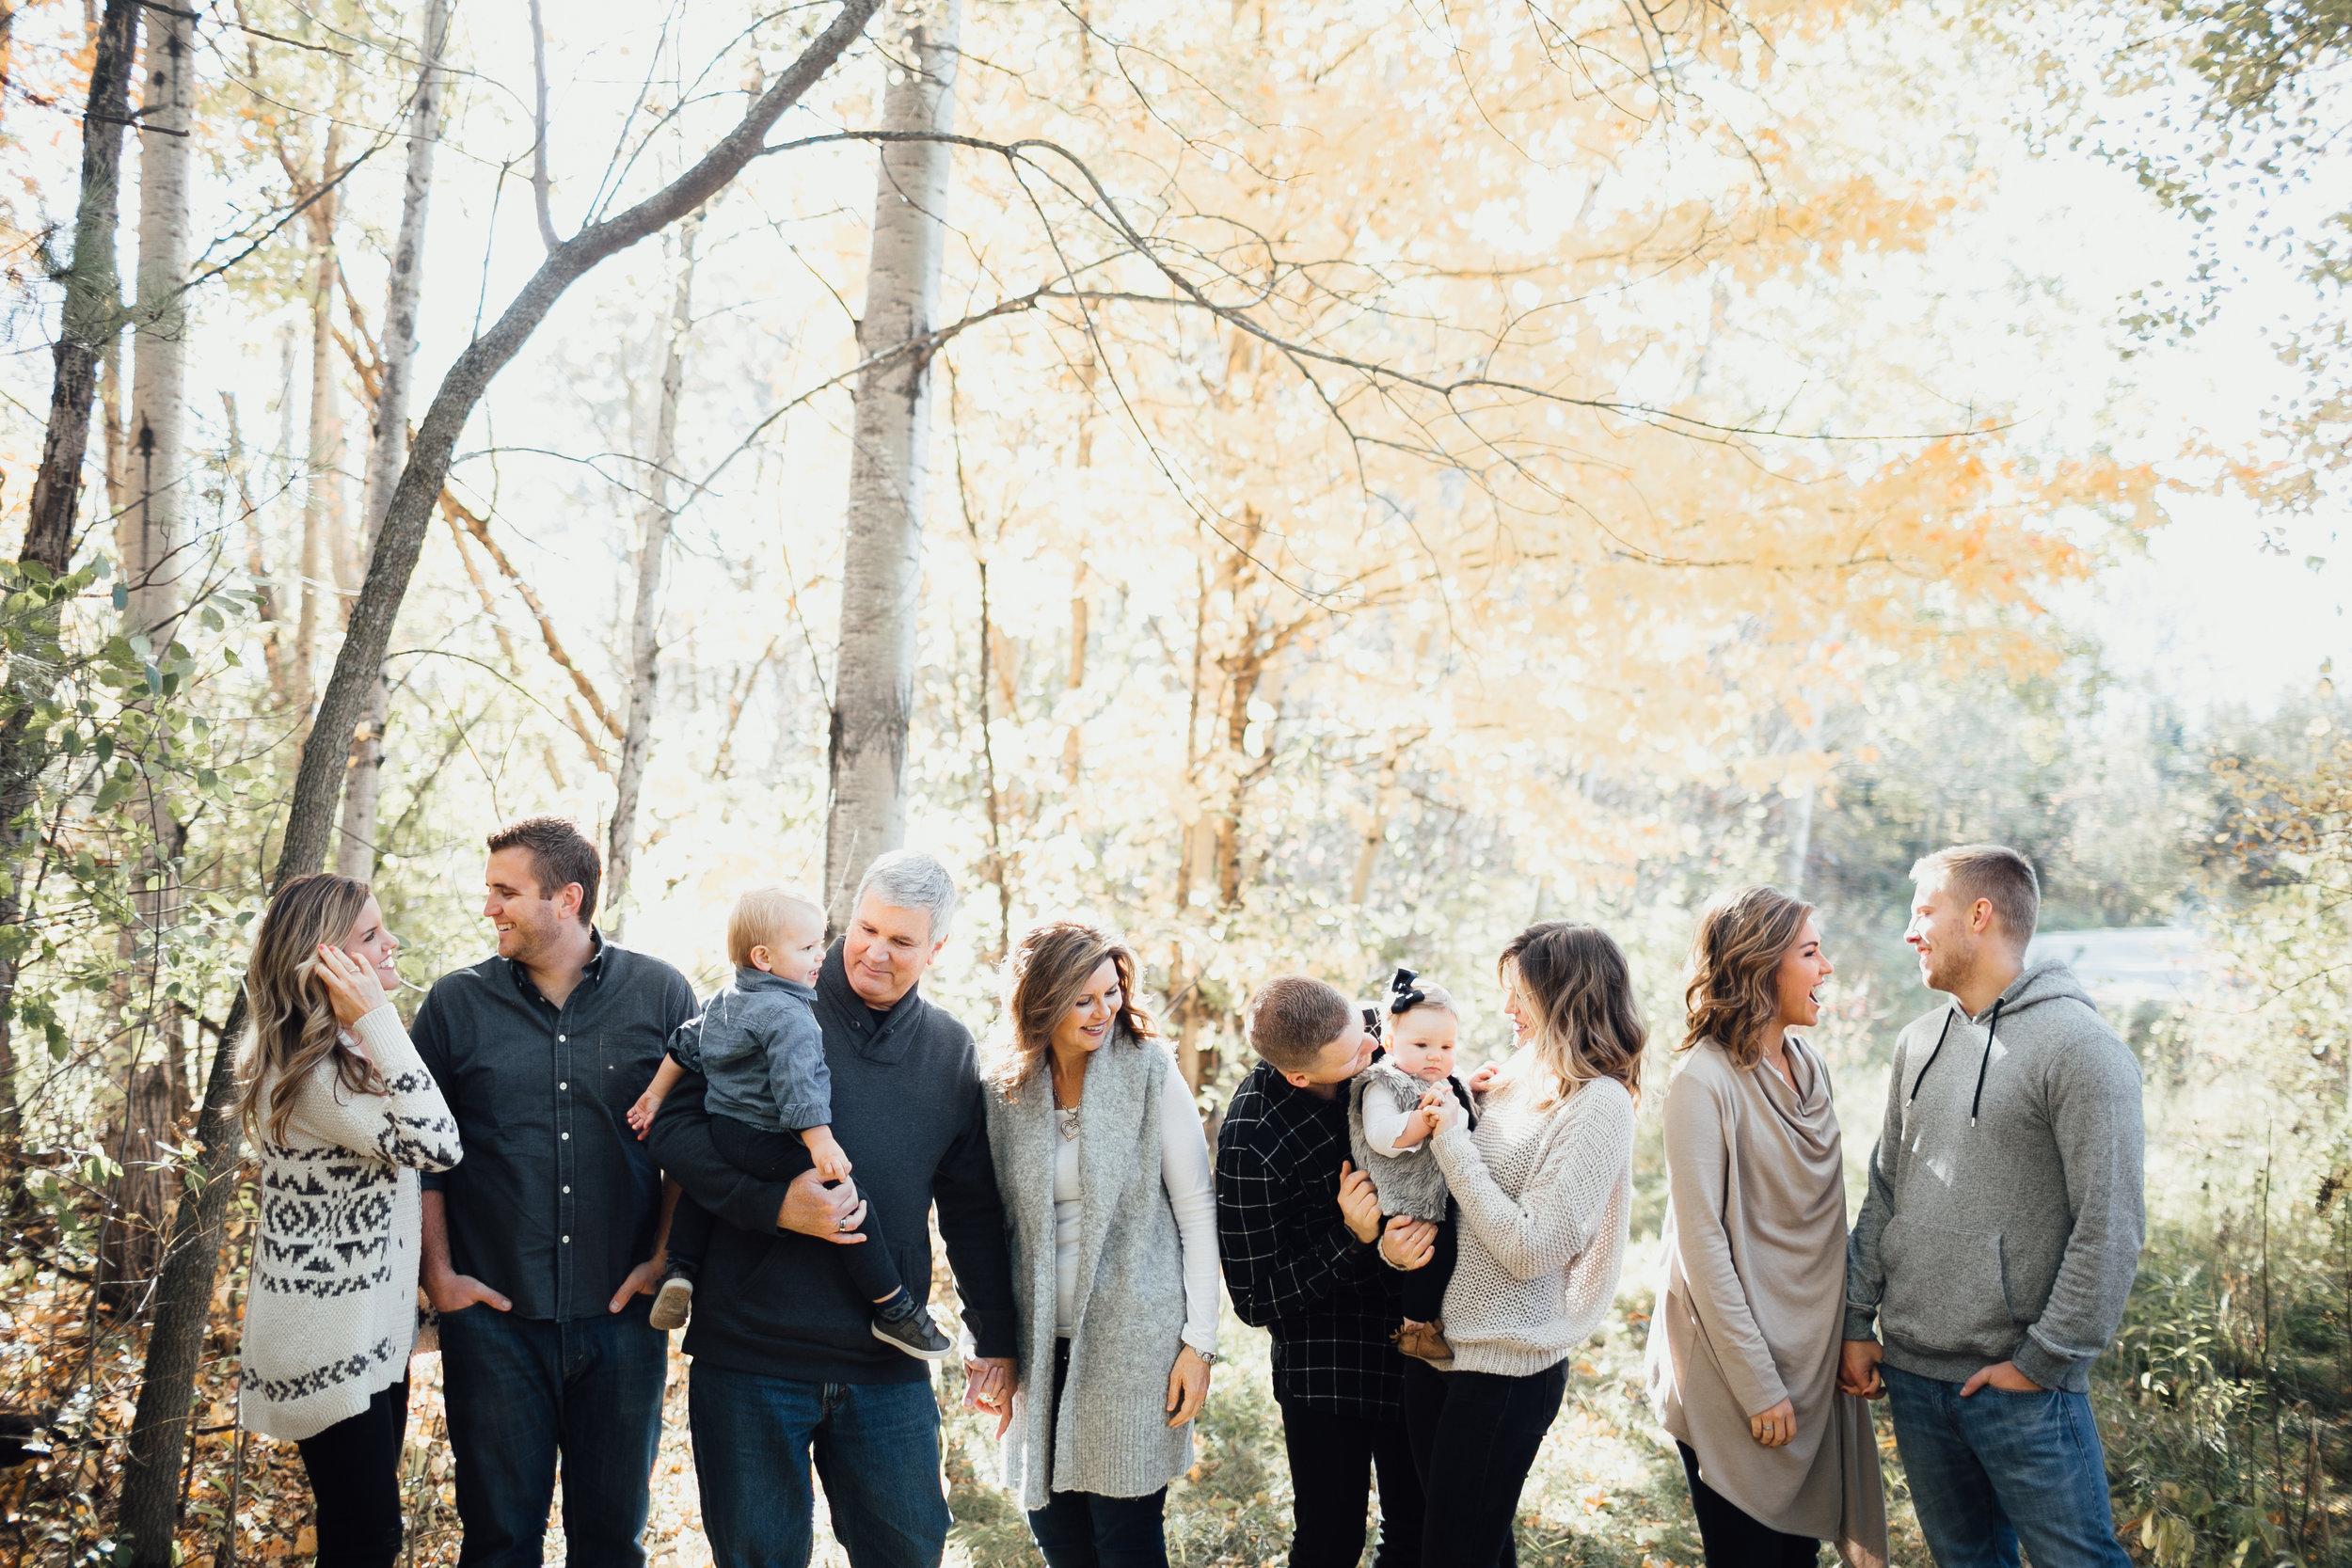 The Groves<br>Family